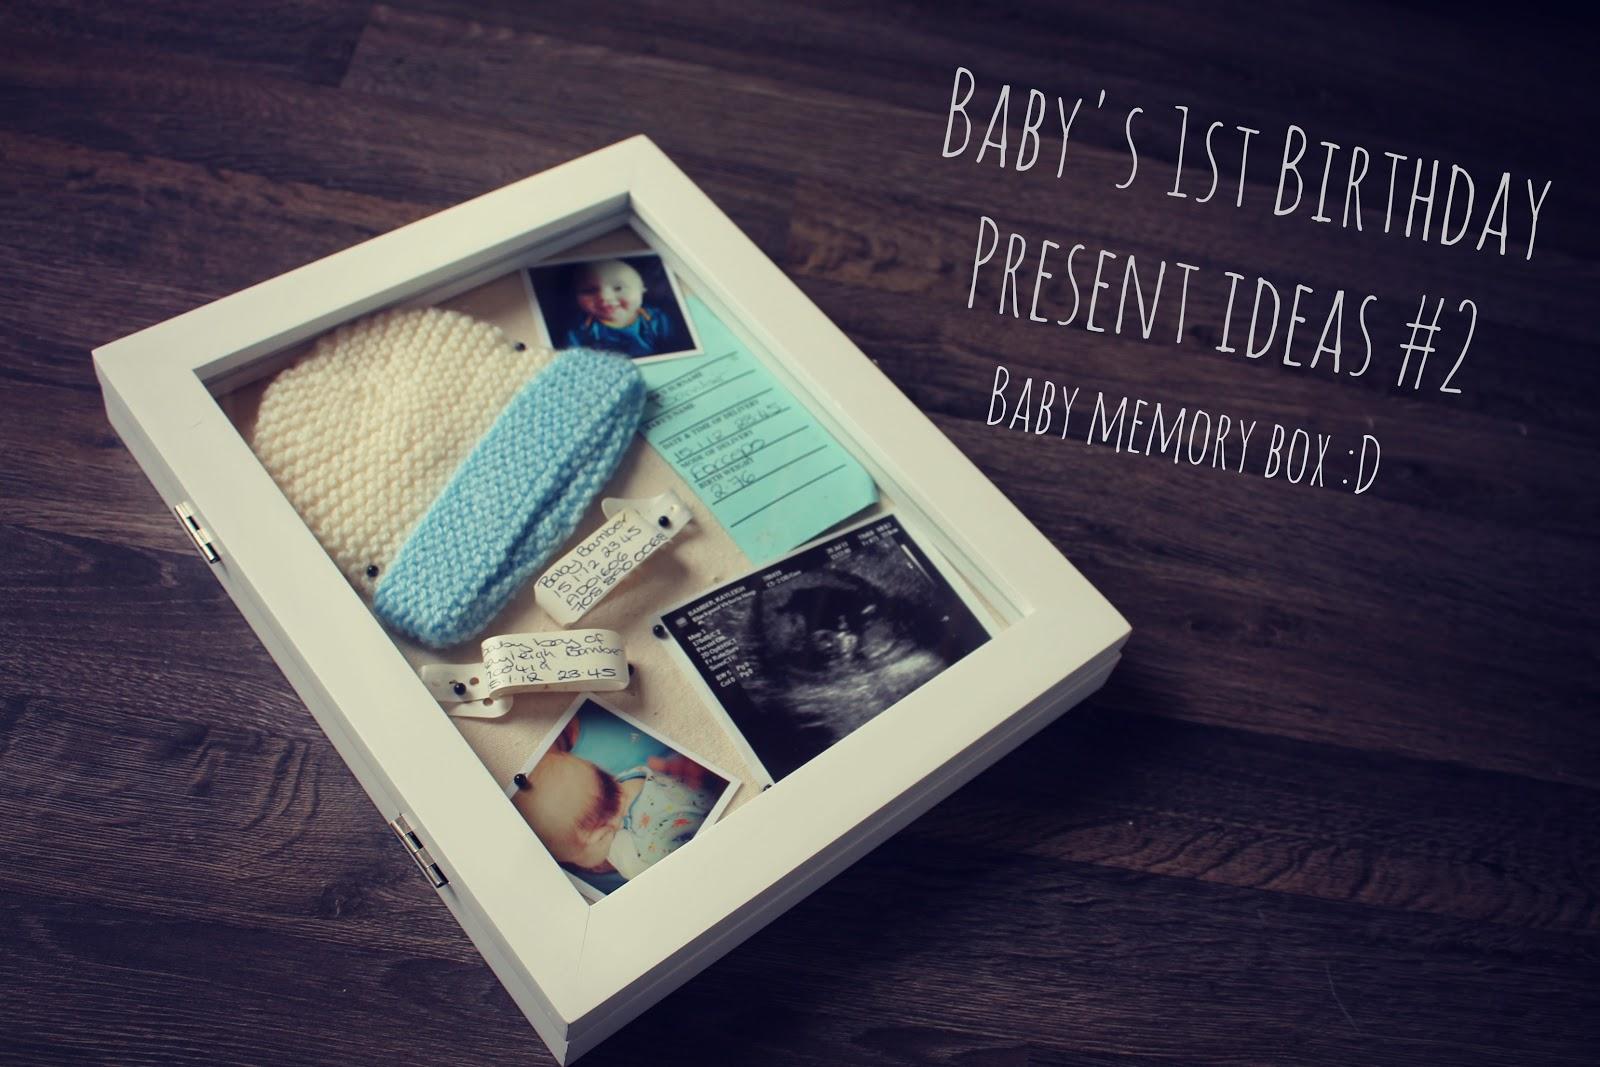 Babys 1st Birthday Present Idea 2